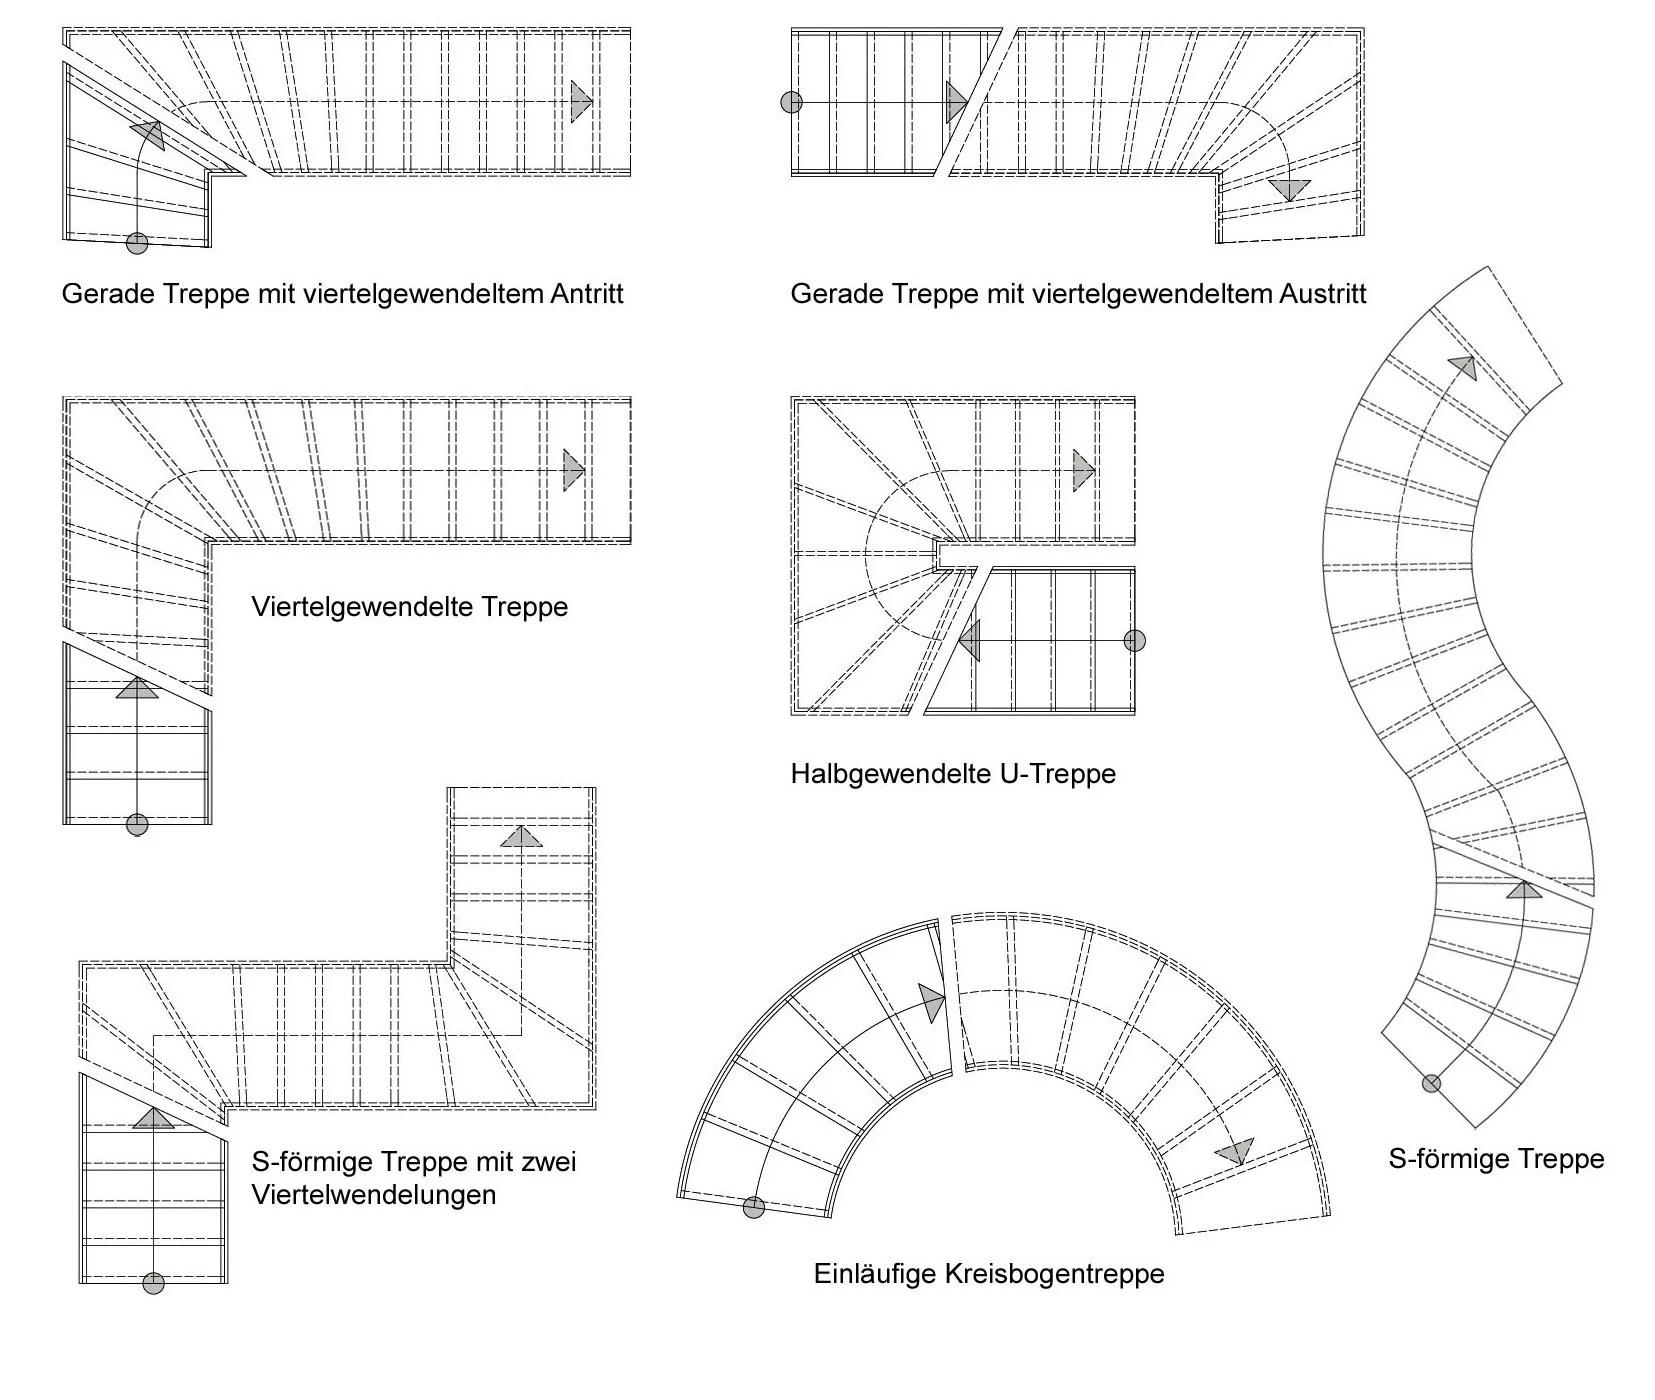 treppe planen berechnen treppen berechnen programm wohn. Black Bedroom Furniture Sets. Home Design Ideas